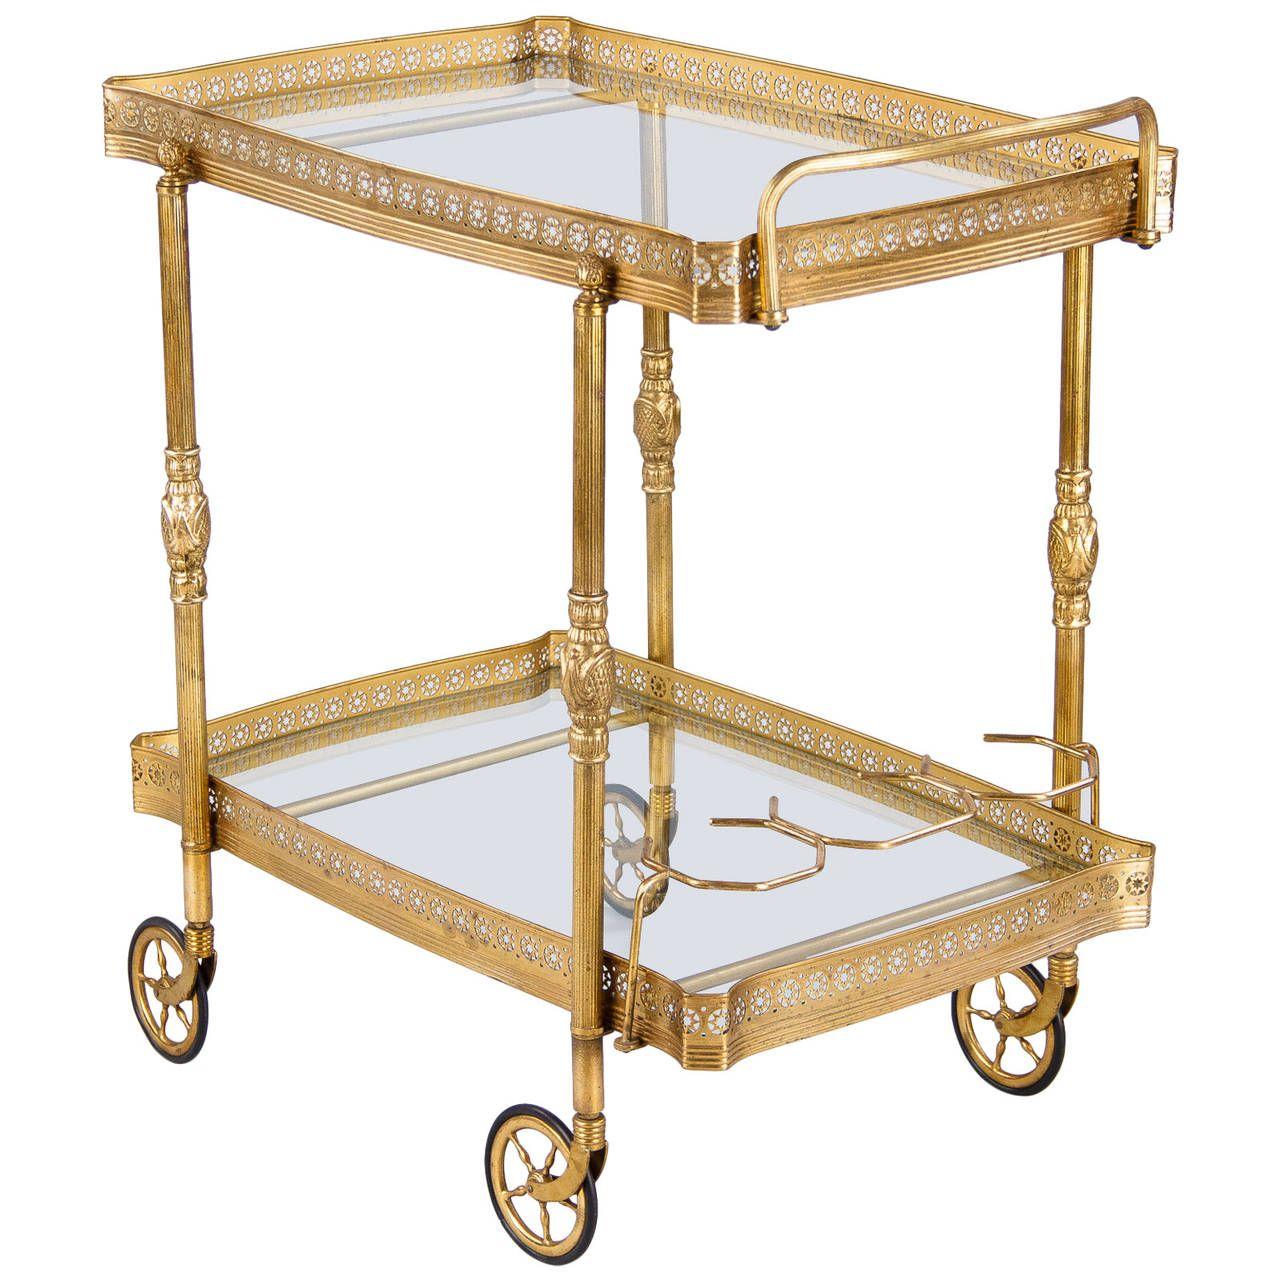 Mid Century French Brass Bar Cart At 1stdibs Brass Bar Cart Mid Century Bar Cart French Brass Antique brass bar cart